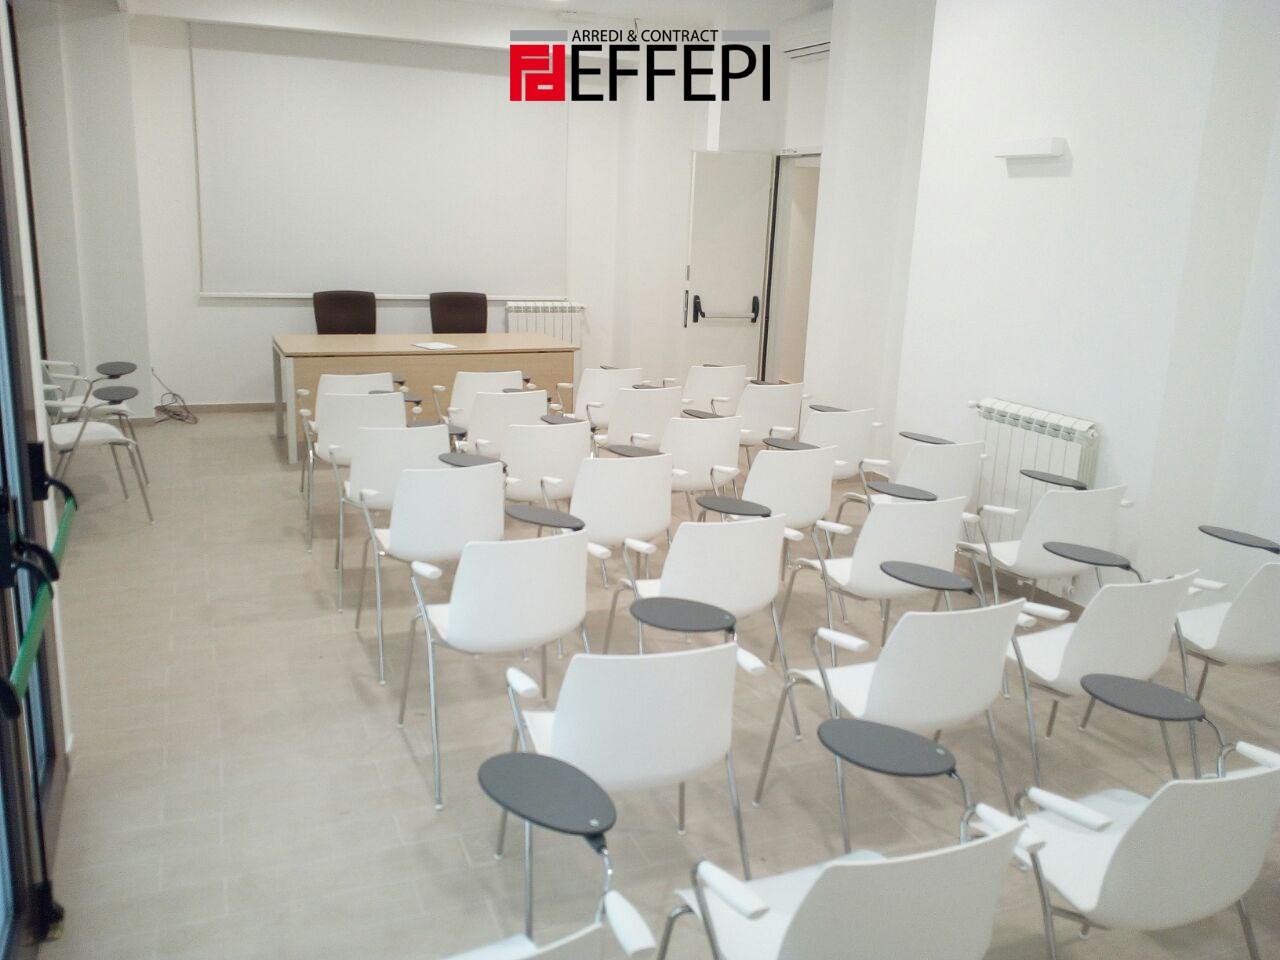 Le Candele Palermo.Sala Corsi Clinica Candela A Palermo Effepi Arredi